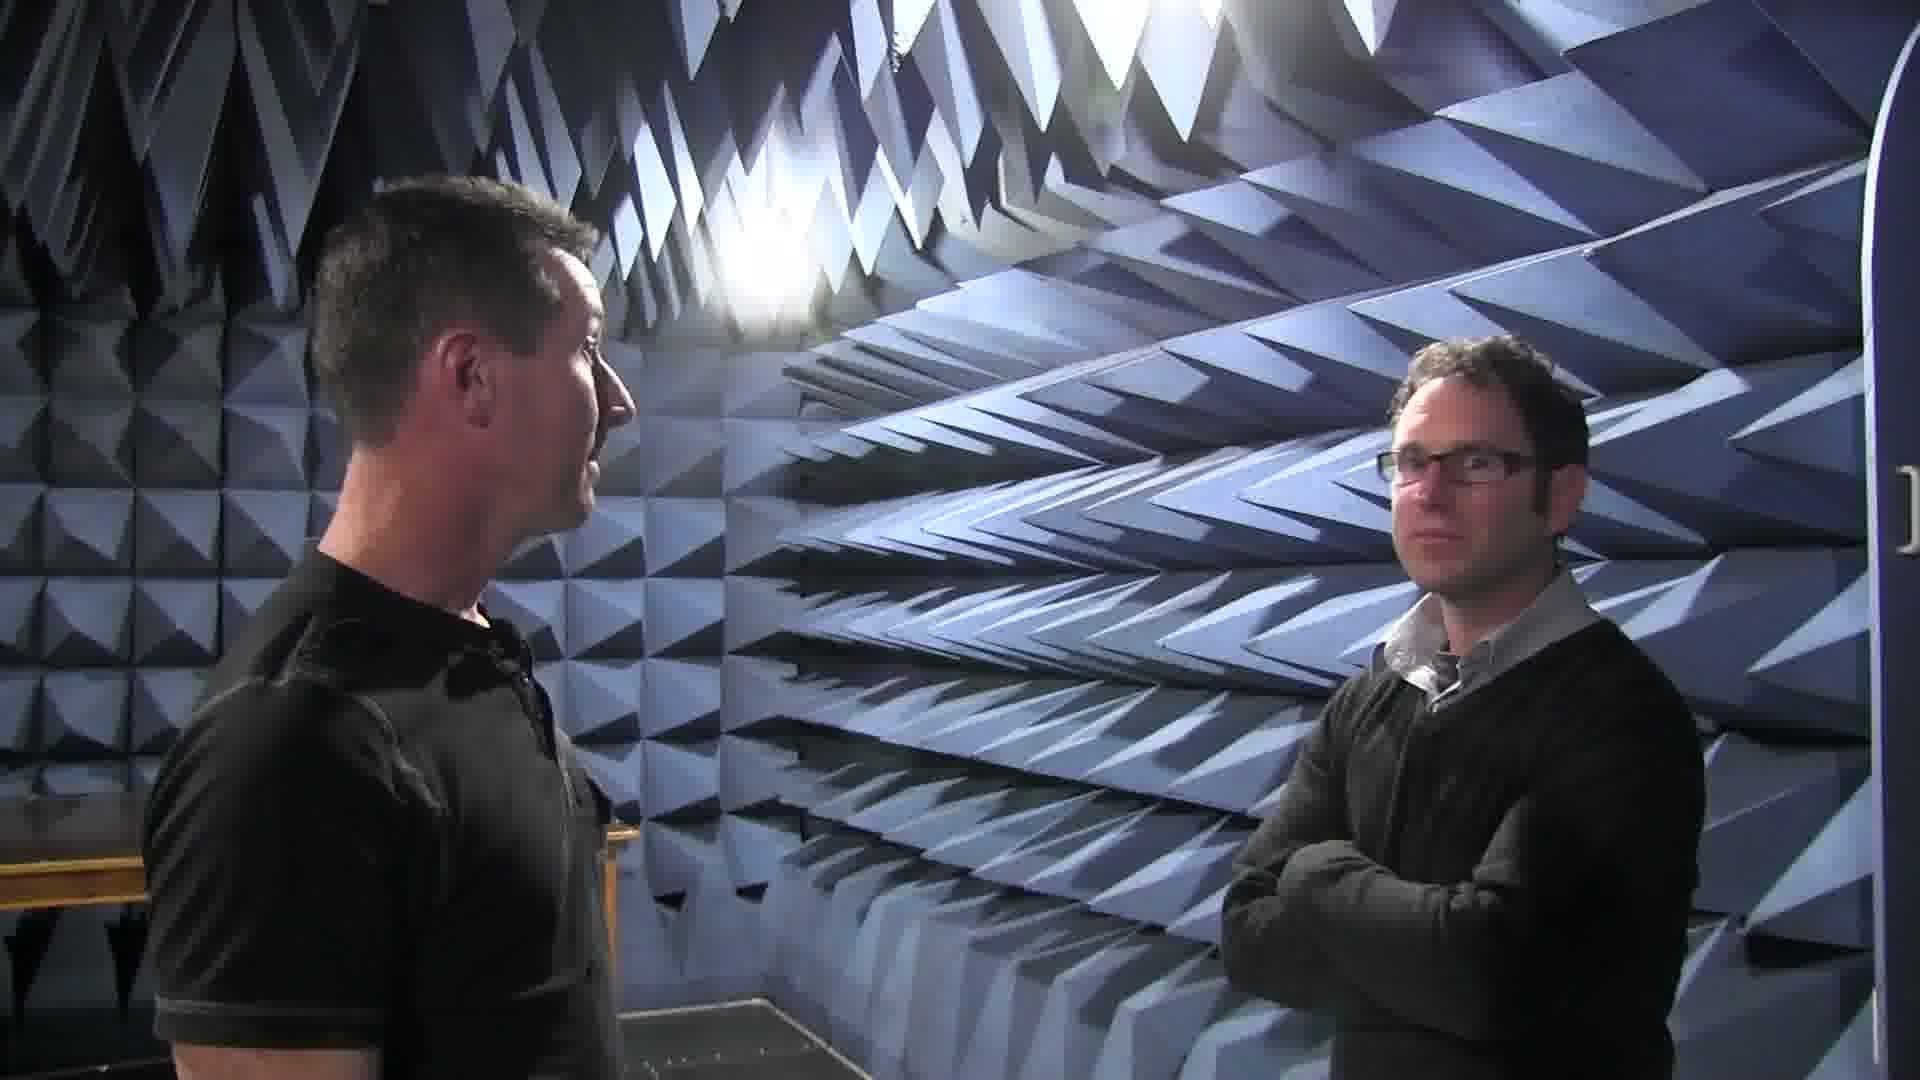 EEVblog #202 – EMC RF Anechoic Test Facility Tour